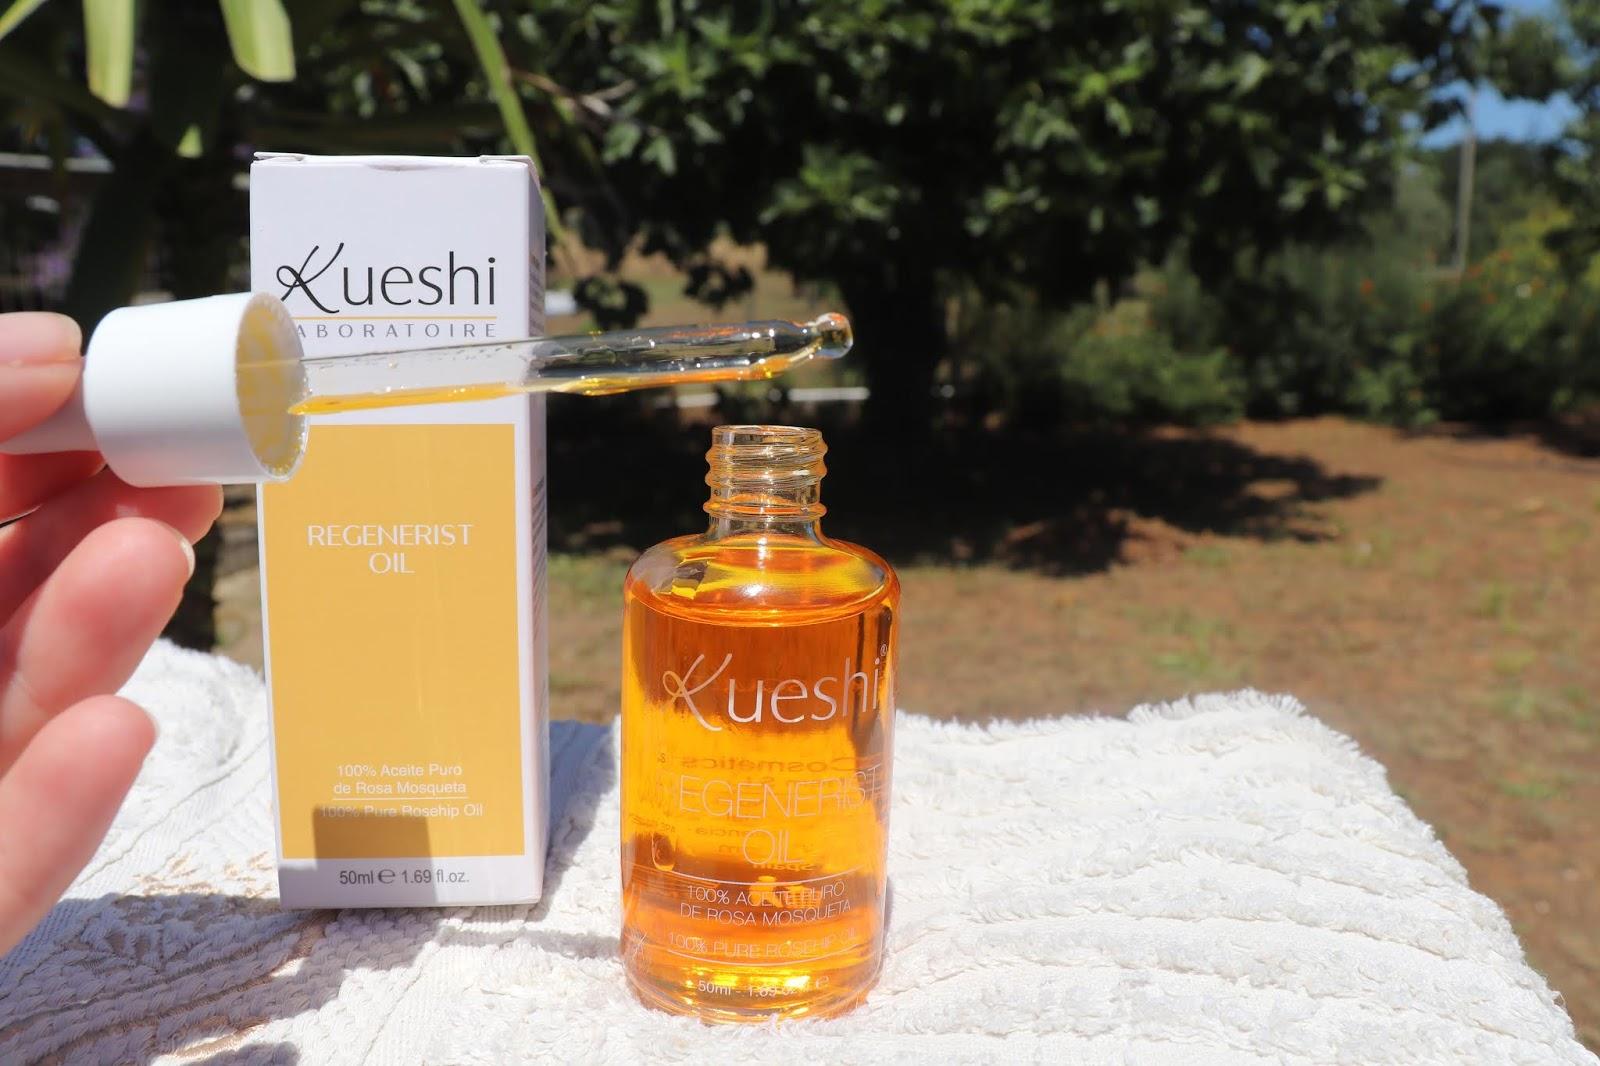 KUESHI LABORATOIRE - REGENERIST OIL (50ML)